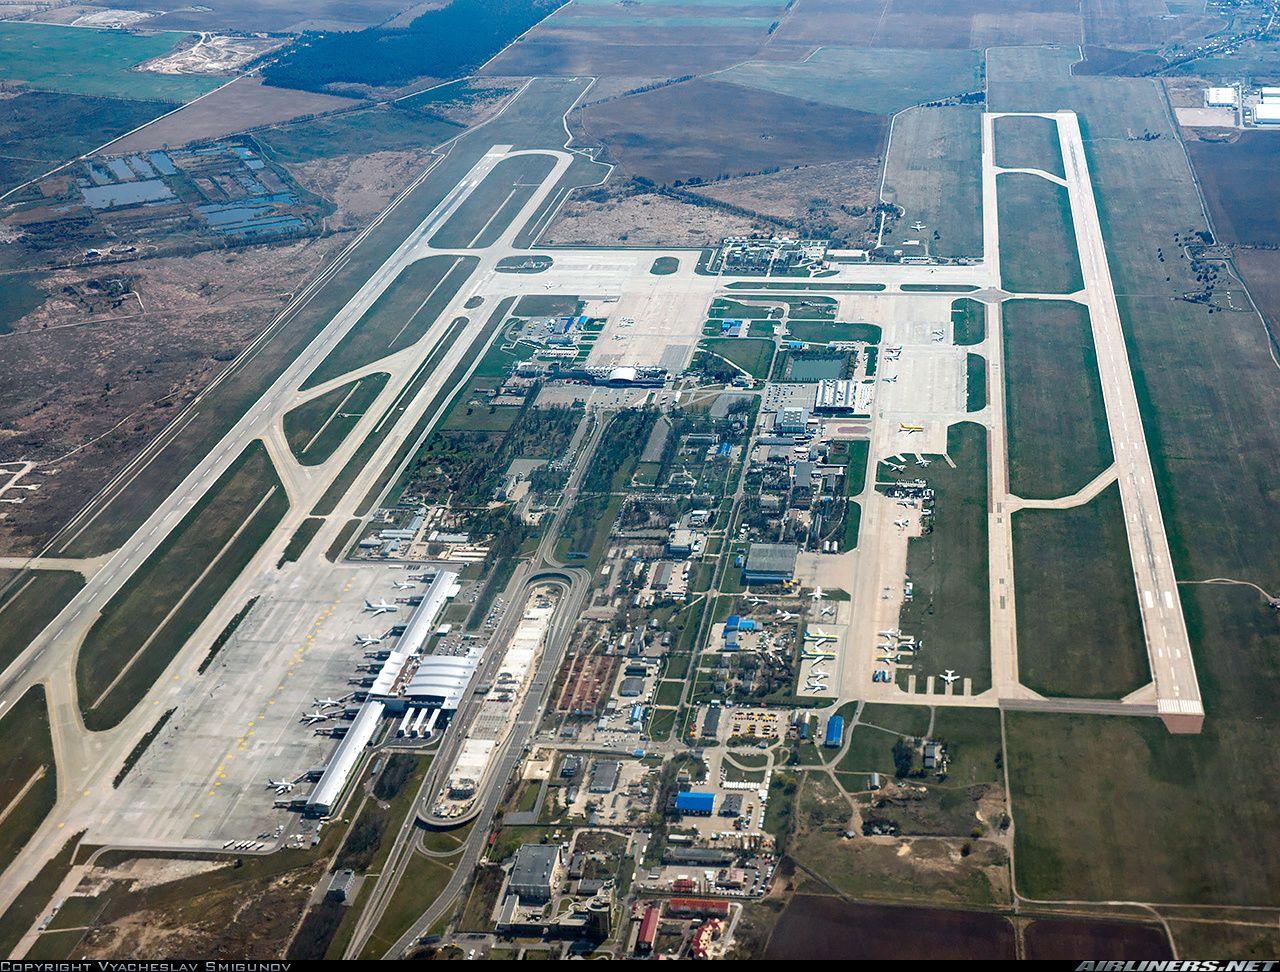 Kiev Boryspil International Airport Photo, International